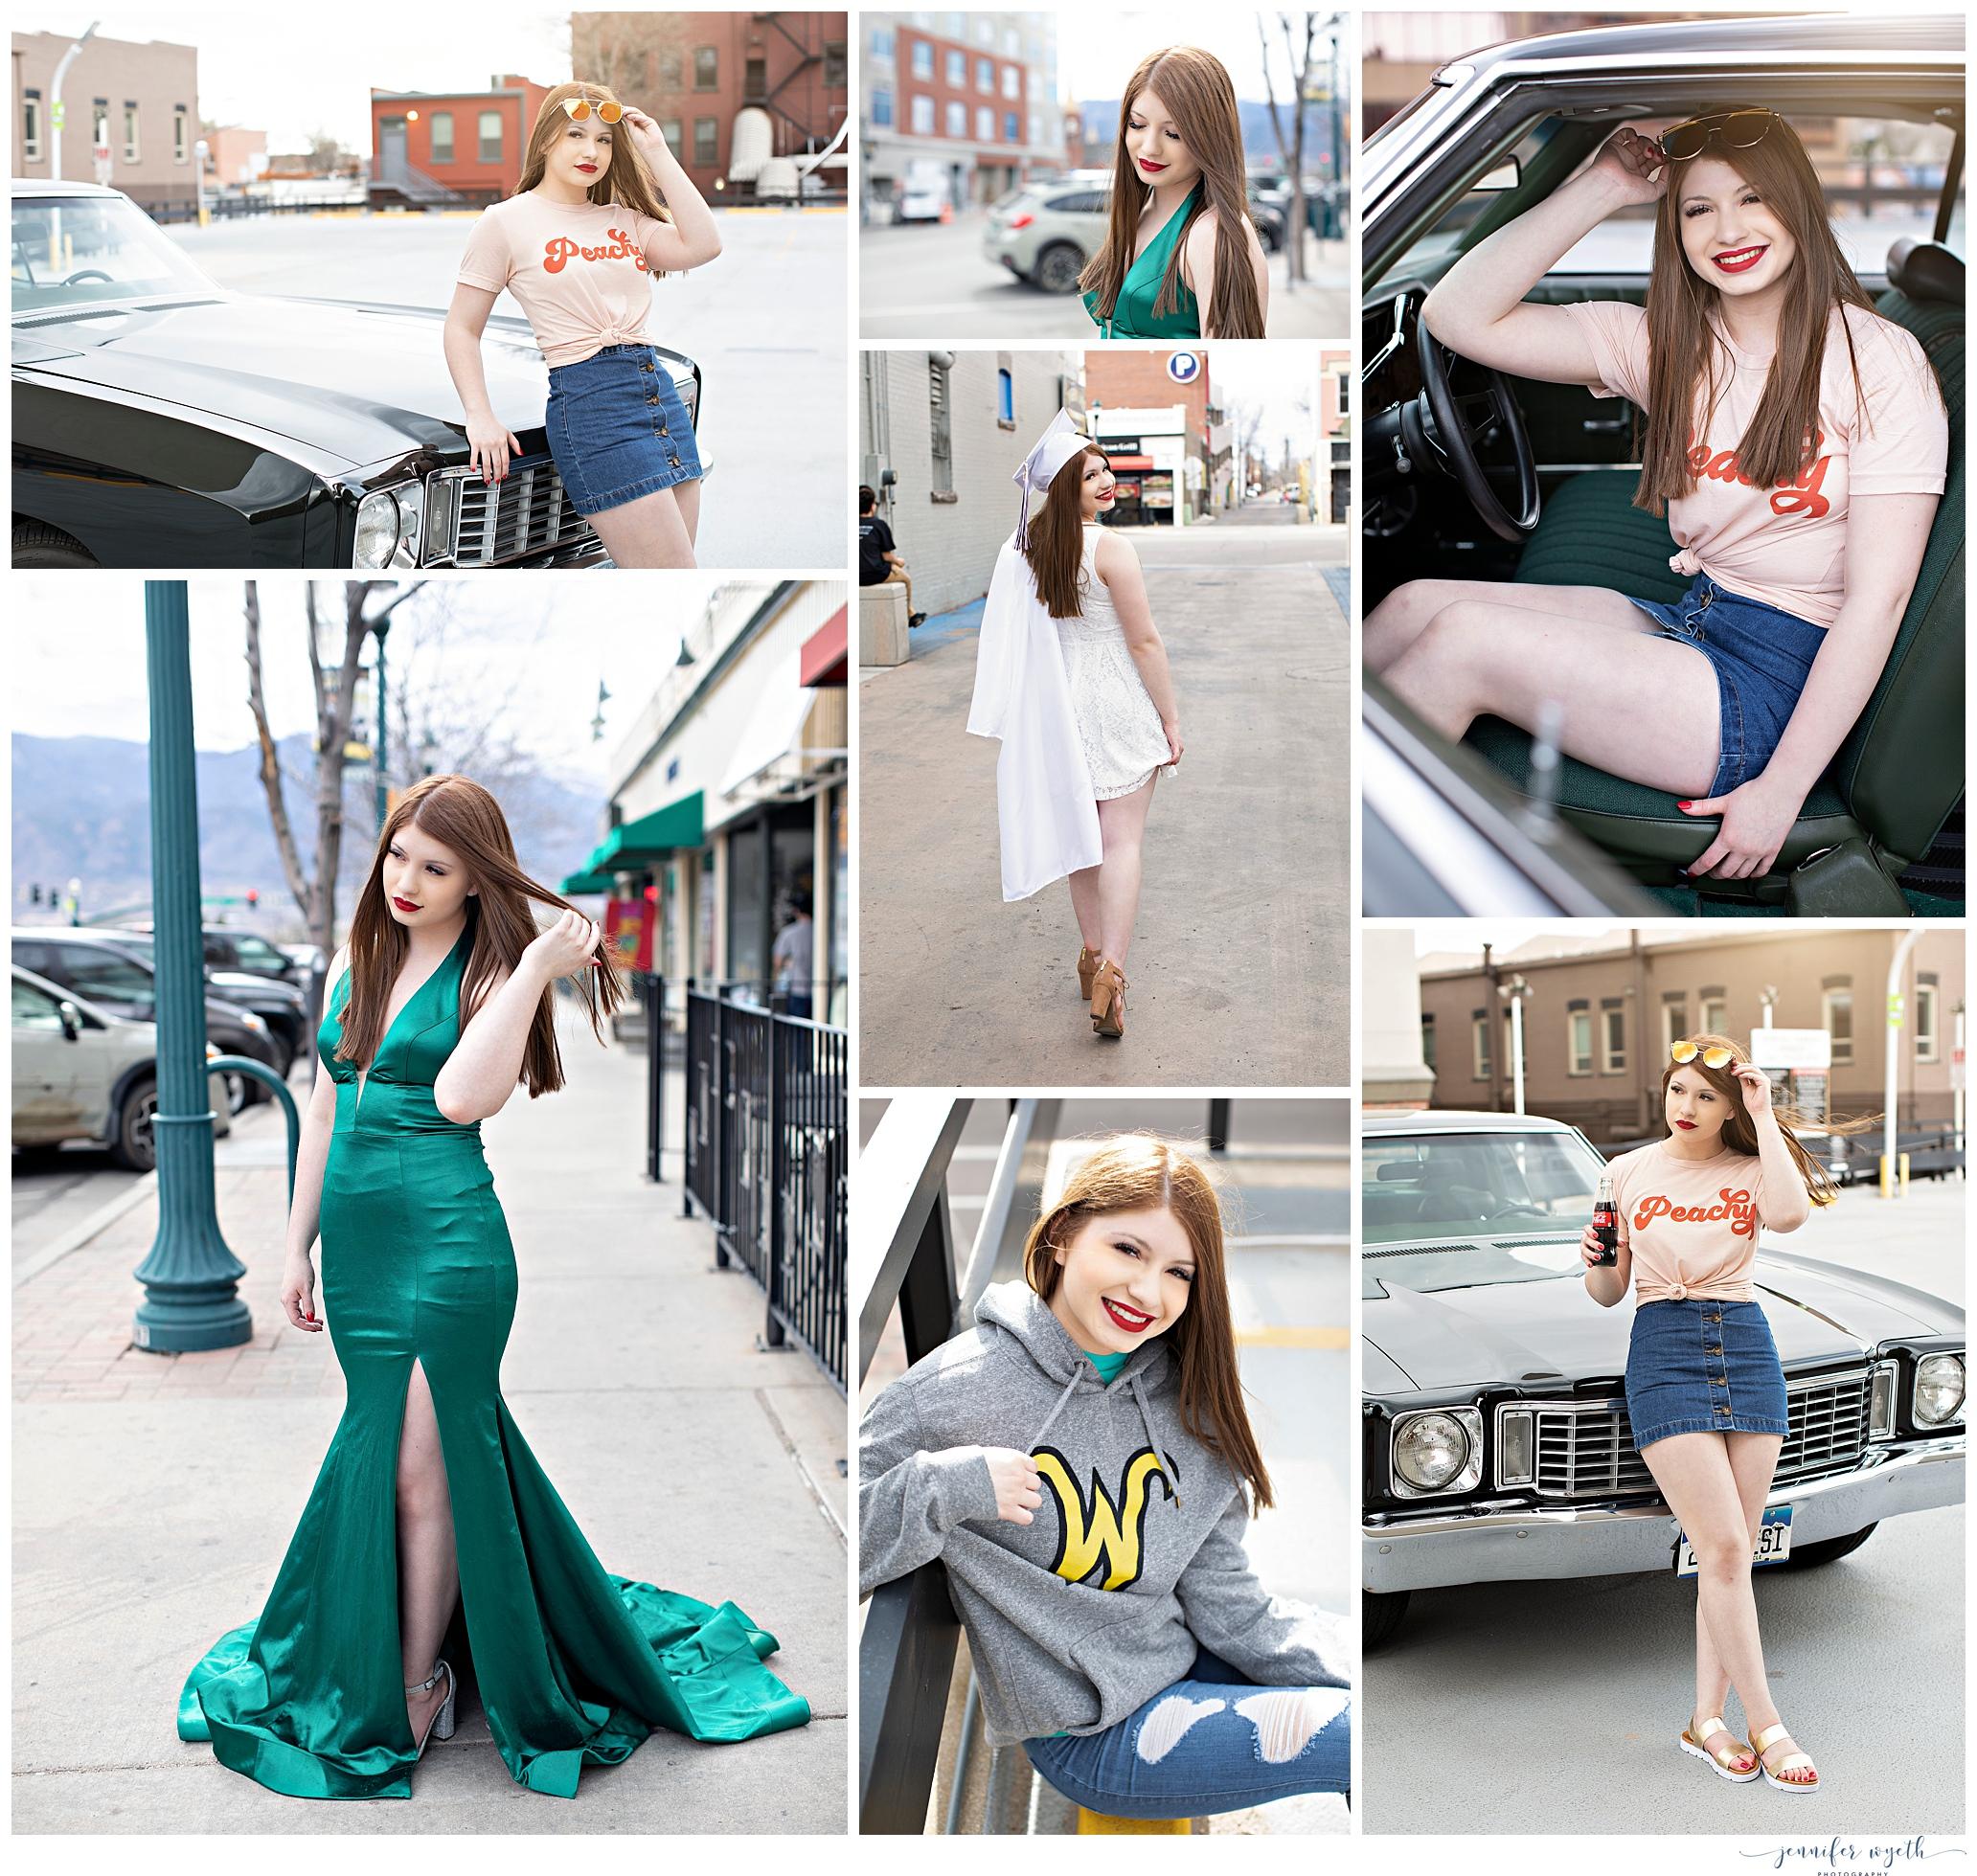 Jennifer-Wyeth-photography-senior-pictures-colorado-springs-photographer_0299.jpg